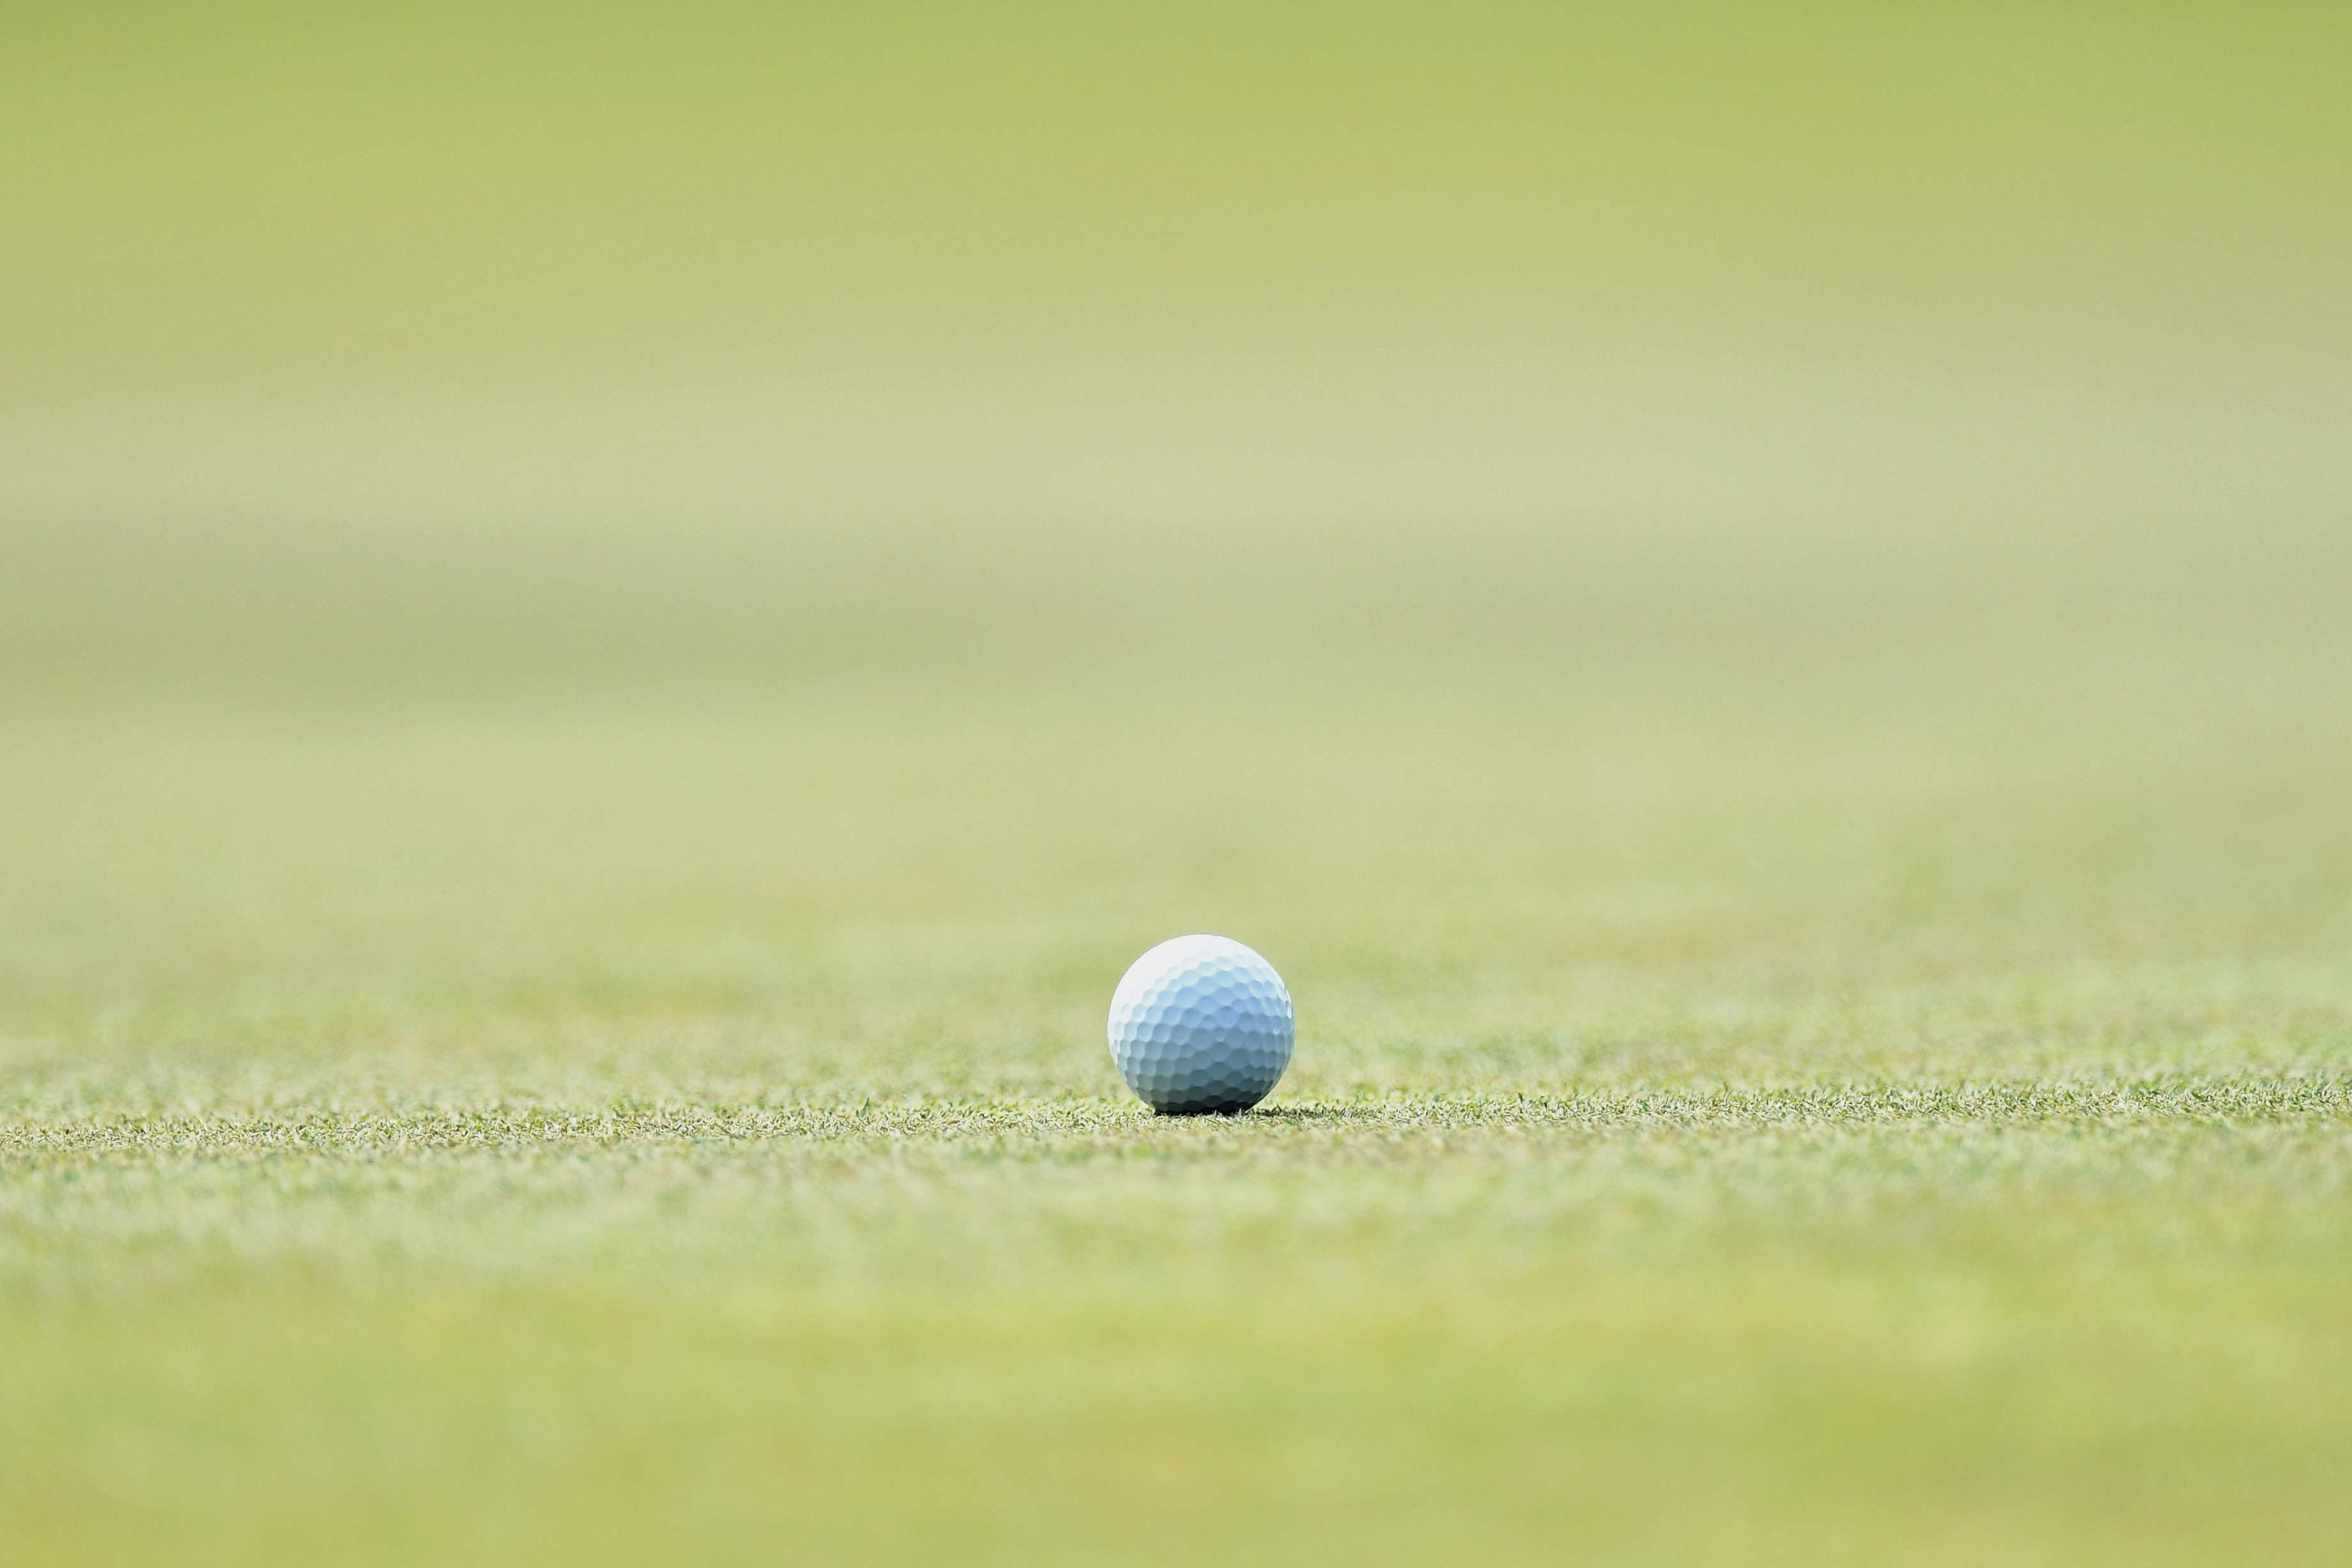 Top tennis player Ashleigh Barty wins golf club championship in Australia